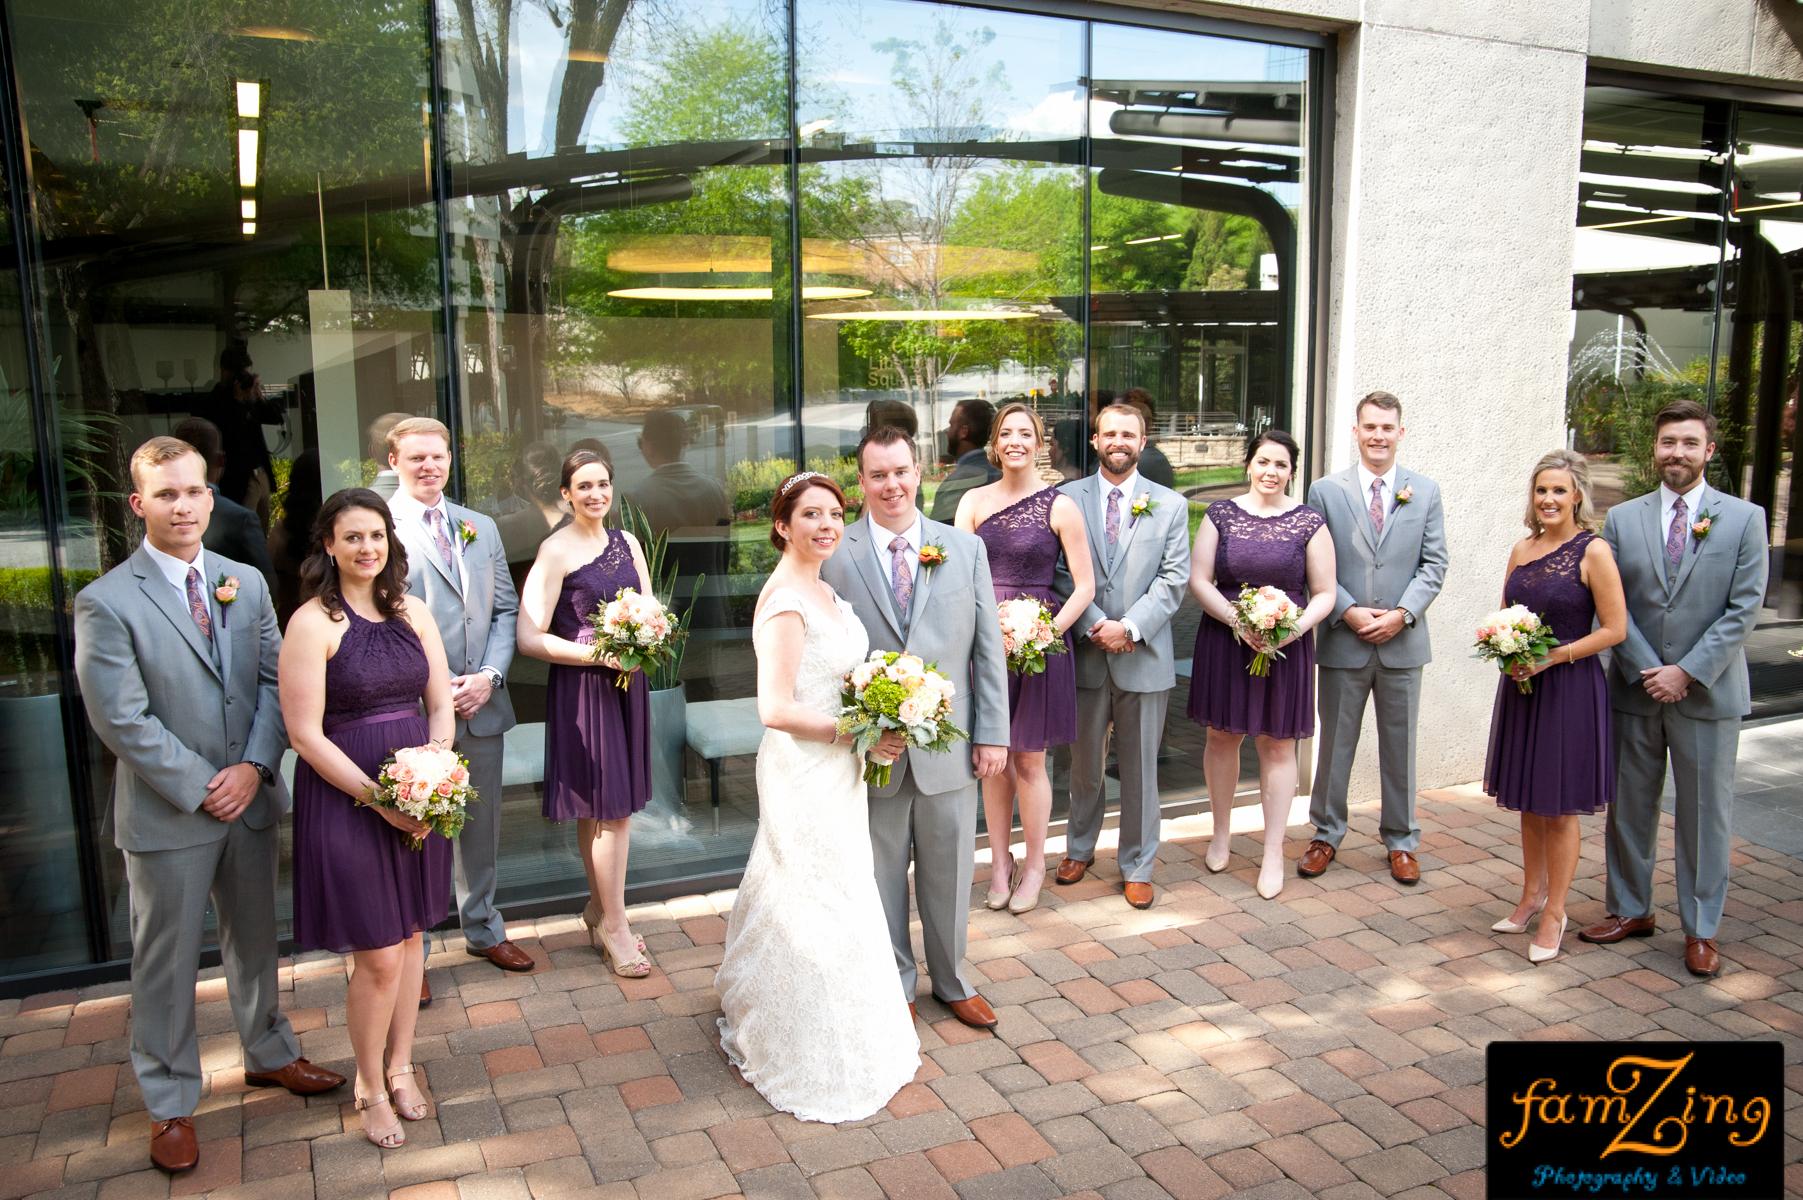 commerce club wedding ceremony reception dj greenville south carolina sc upstate outdoor fun famzing